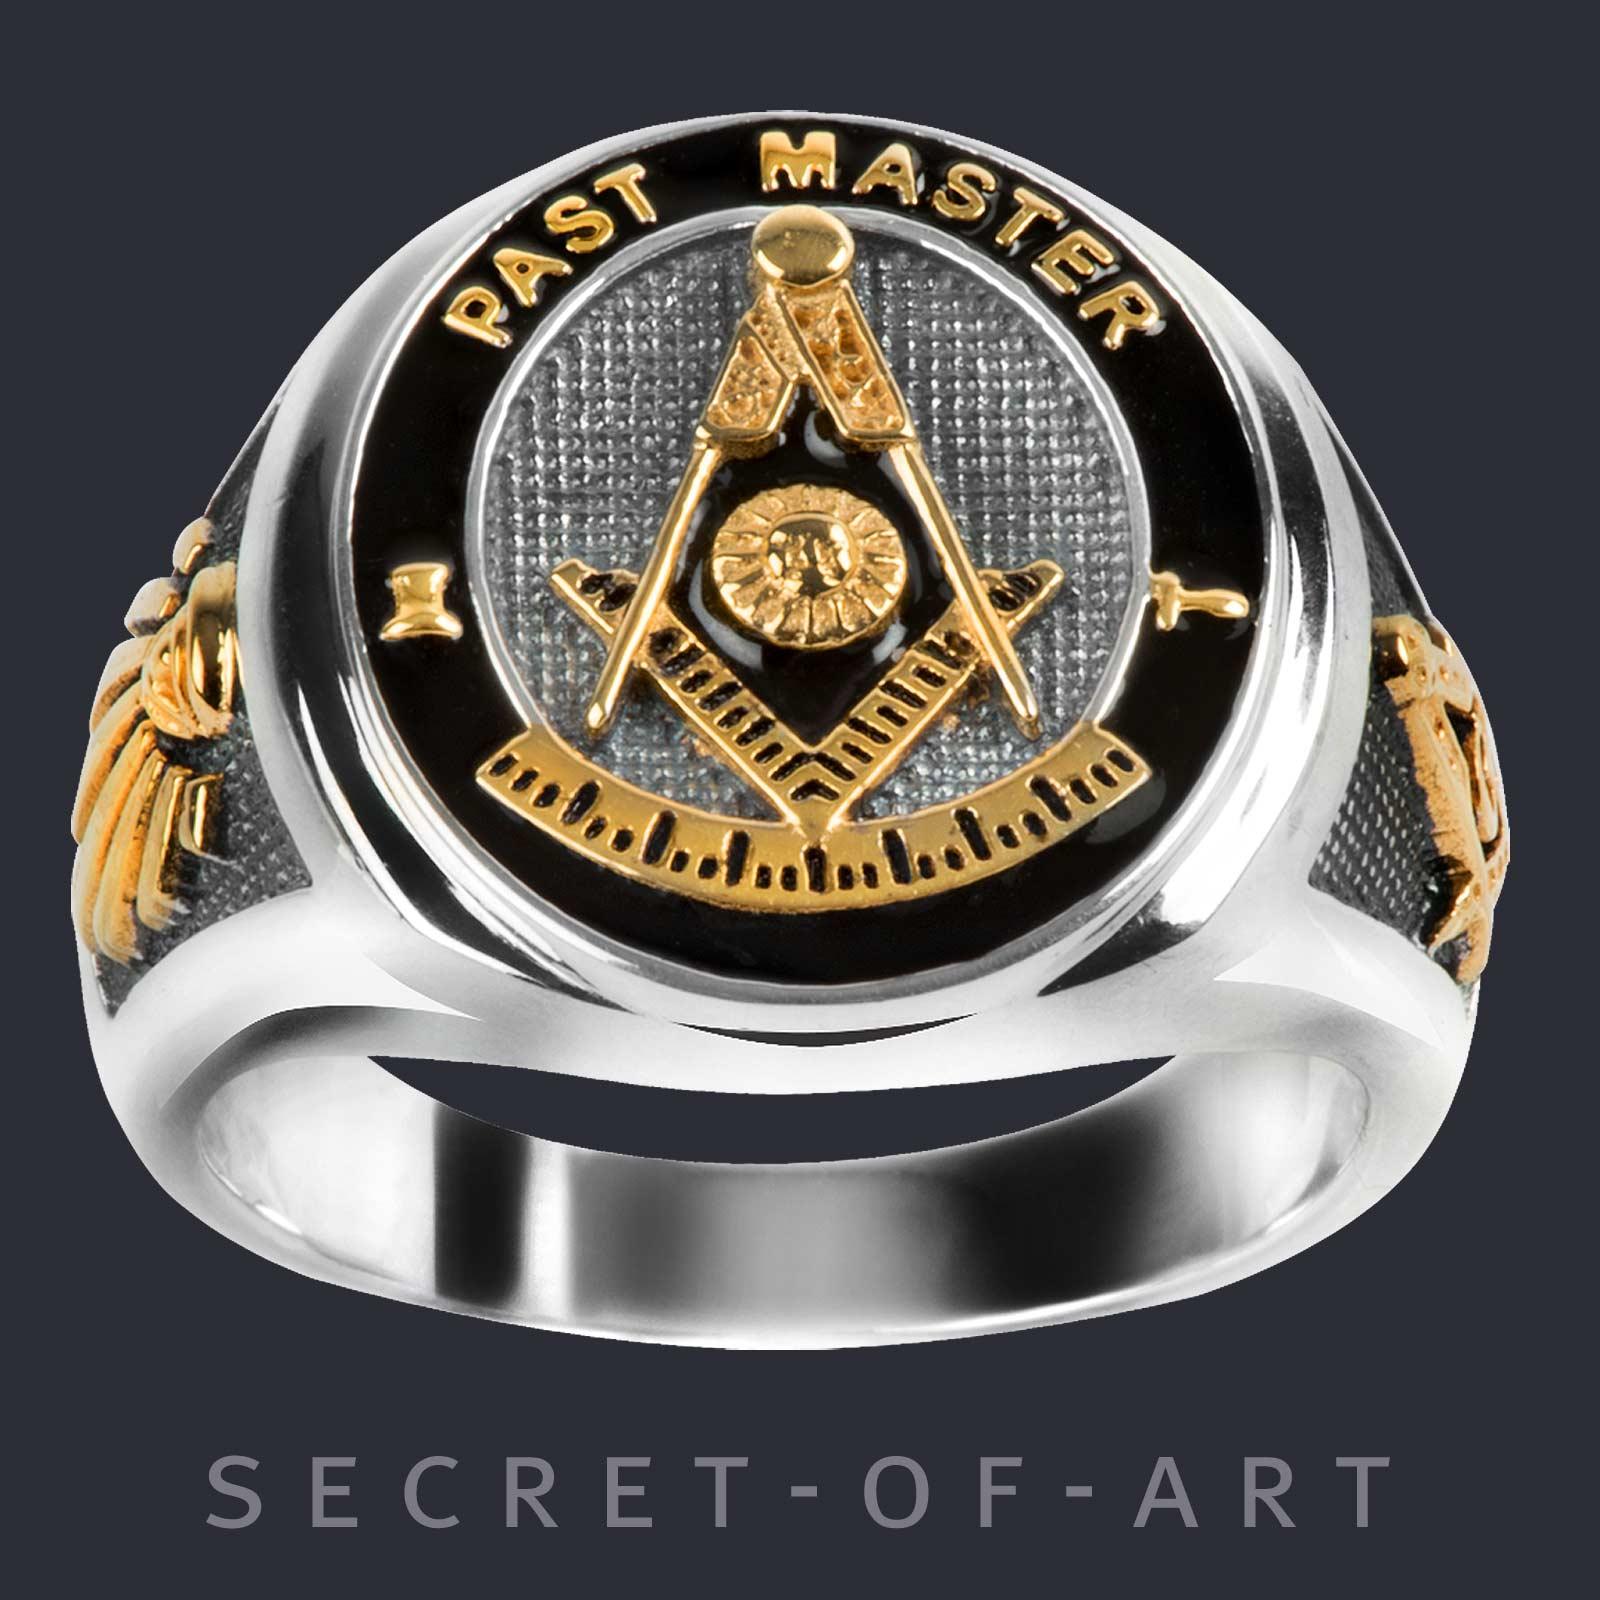 Blue Lodge Ring Masonic Signet Ring Freemason jewelry Master Mason gift Masonry Silver 925 Sterling with 24K Gold-Plated Parts